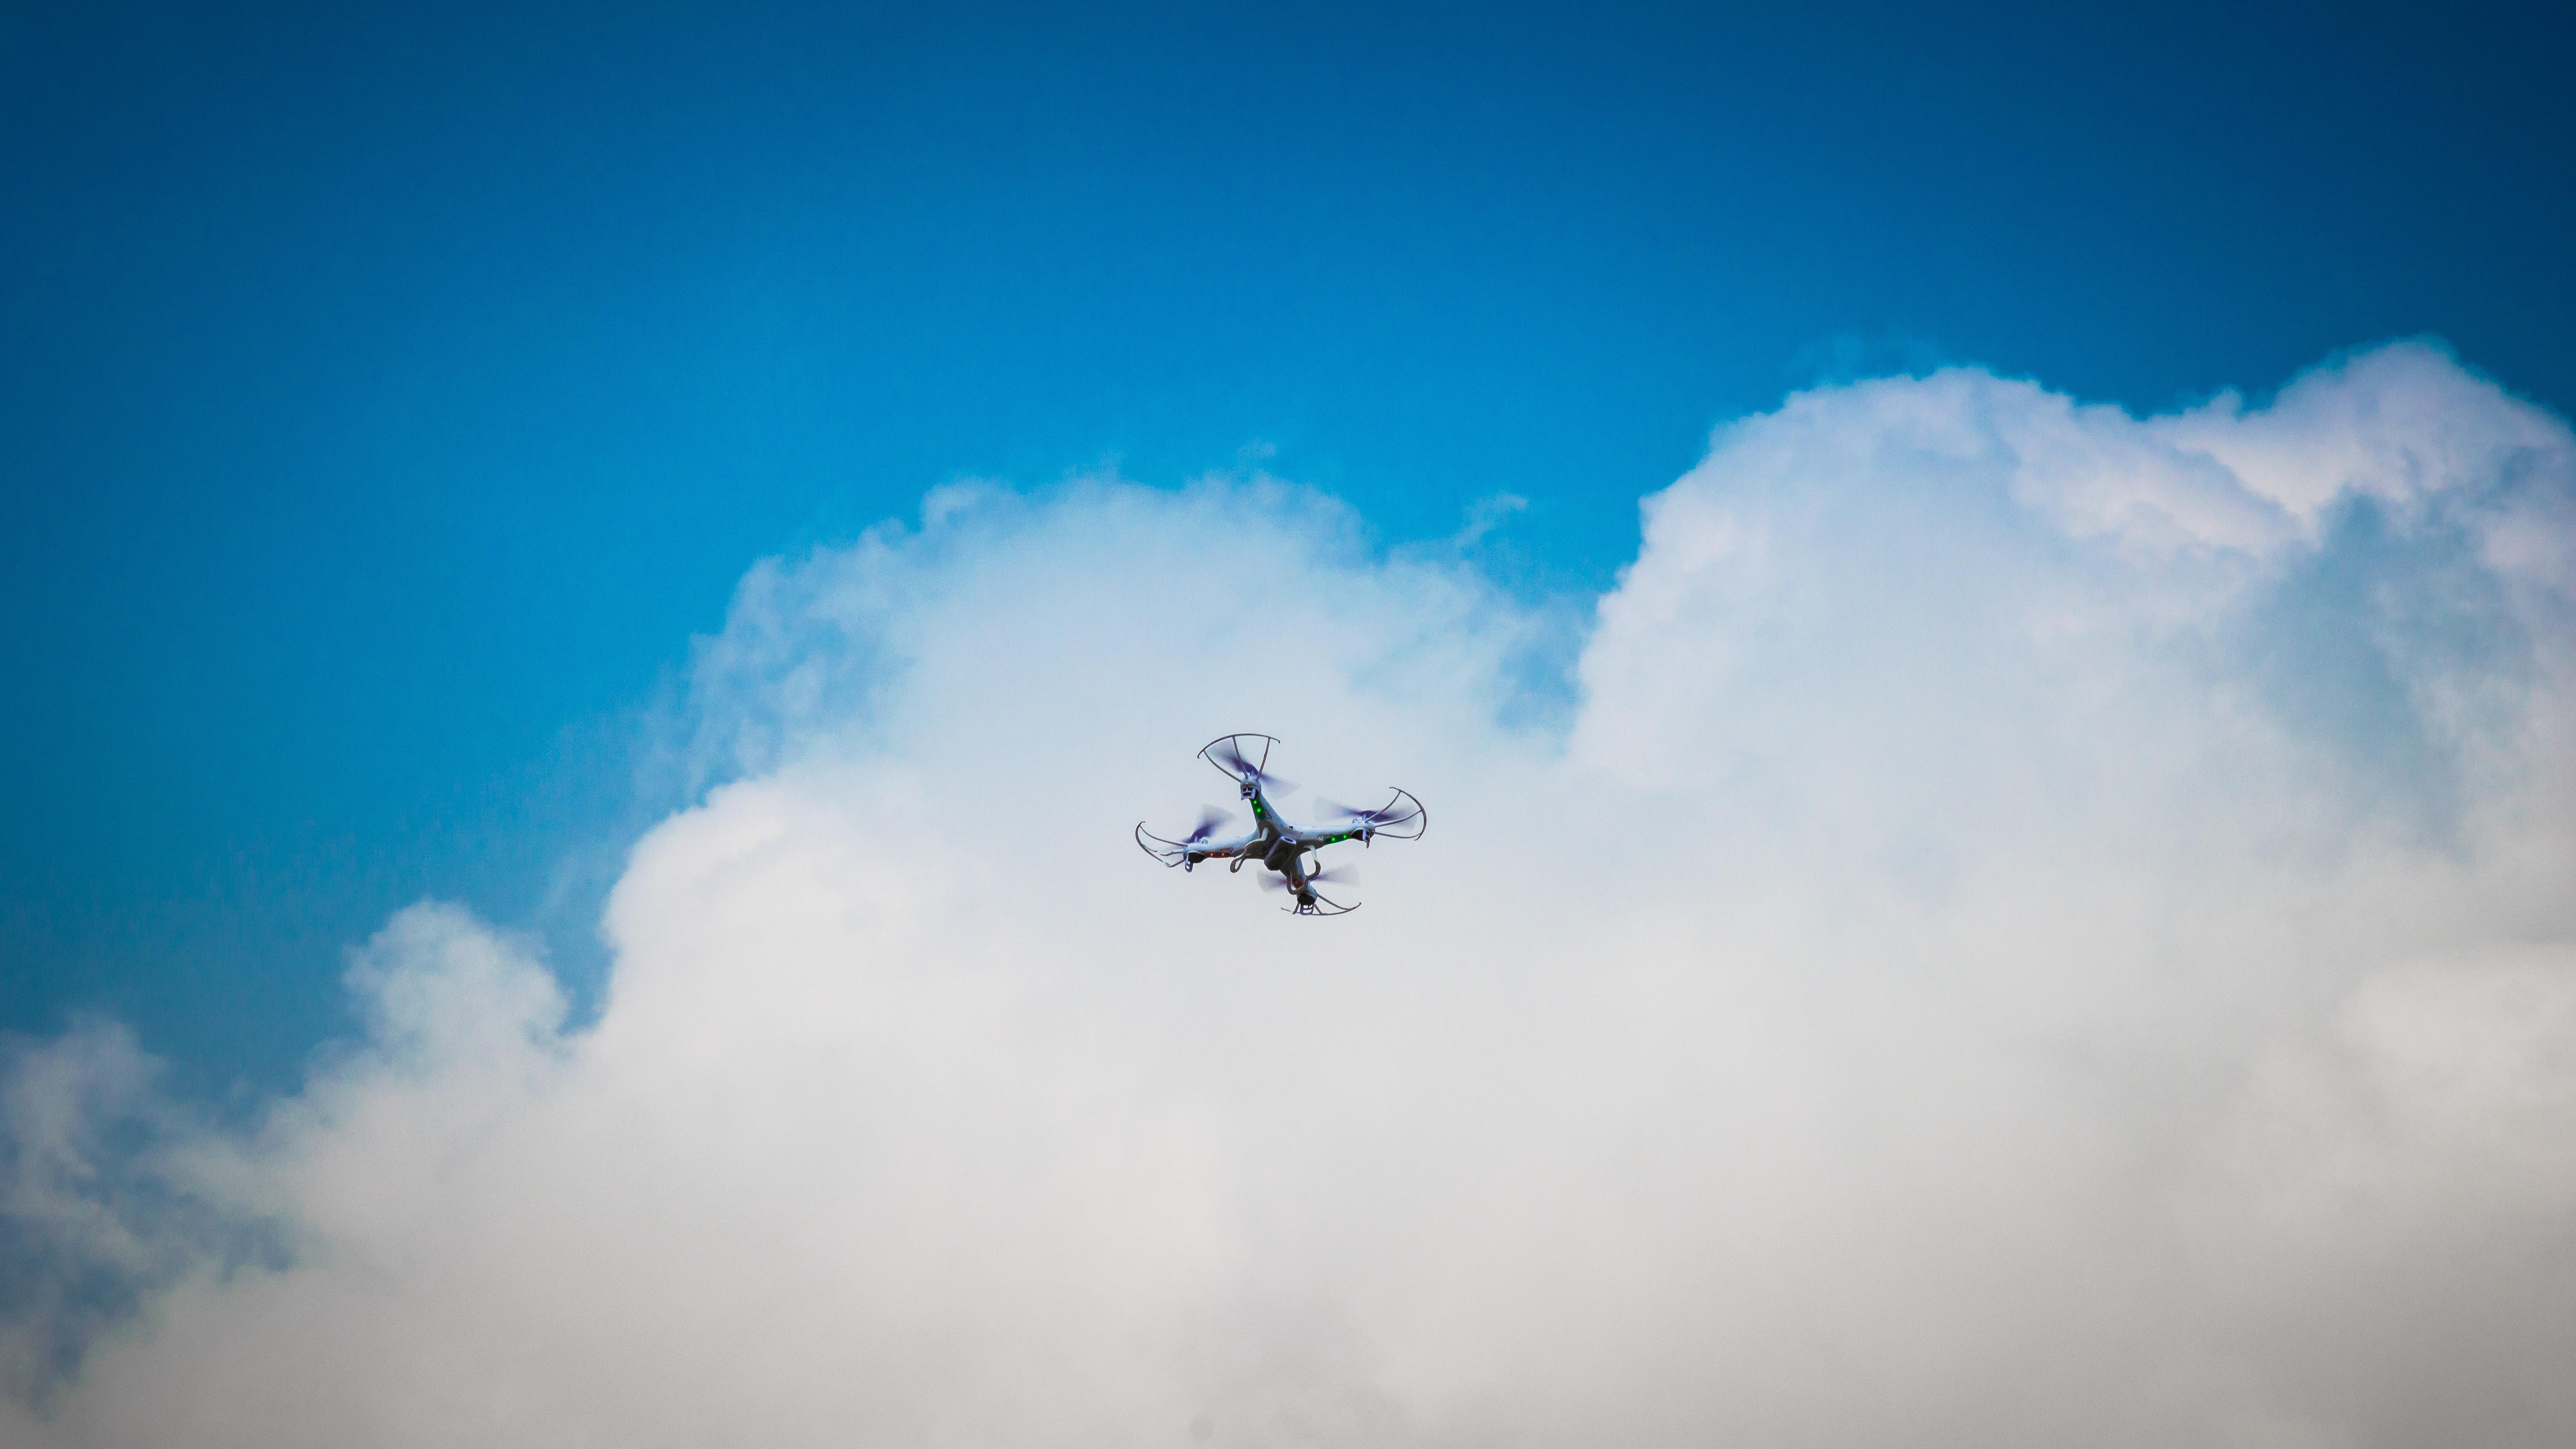 drone-innovation-technology-57544